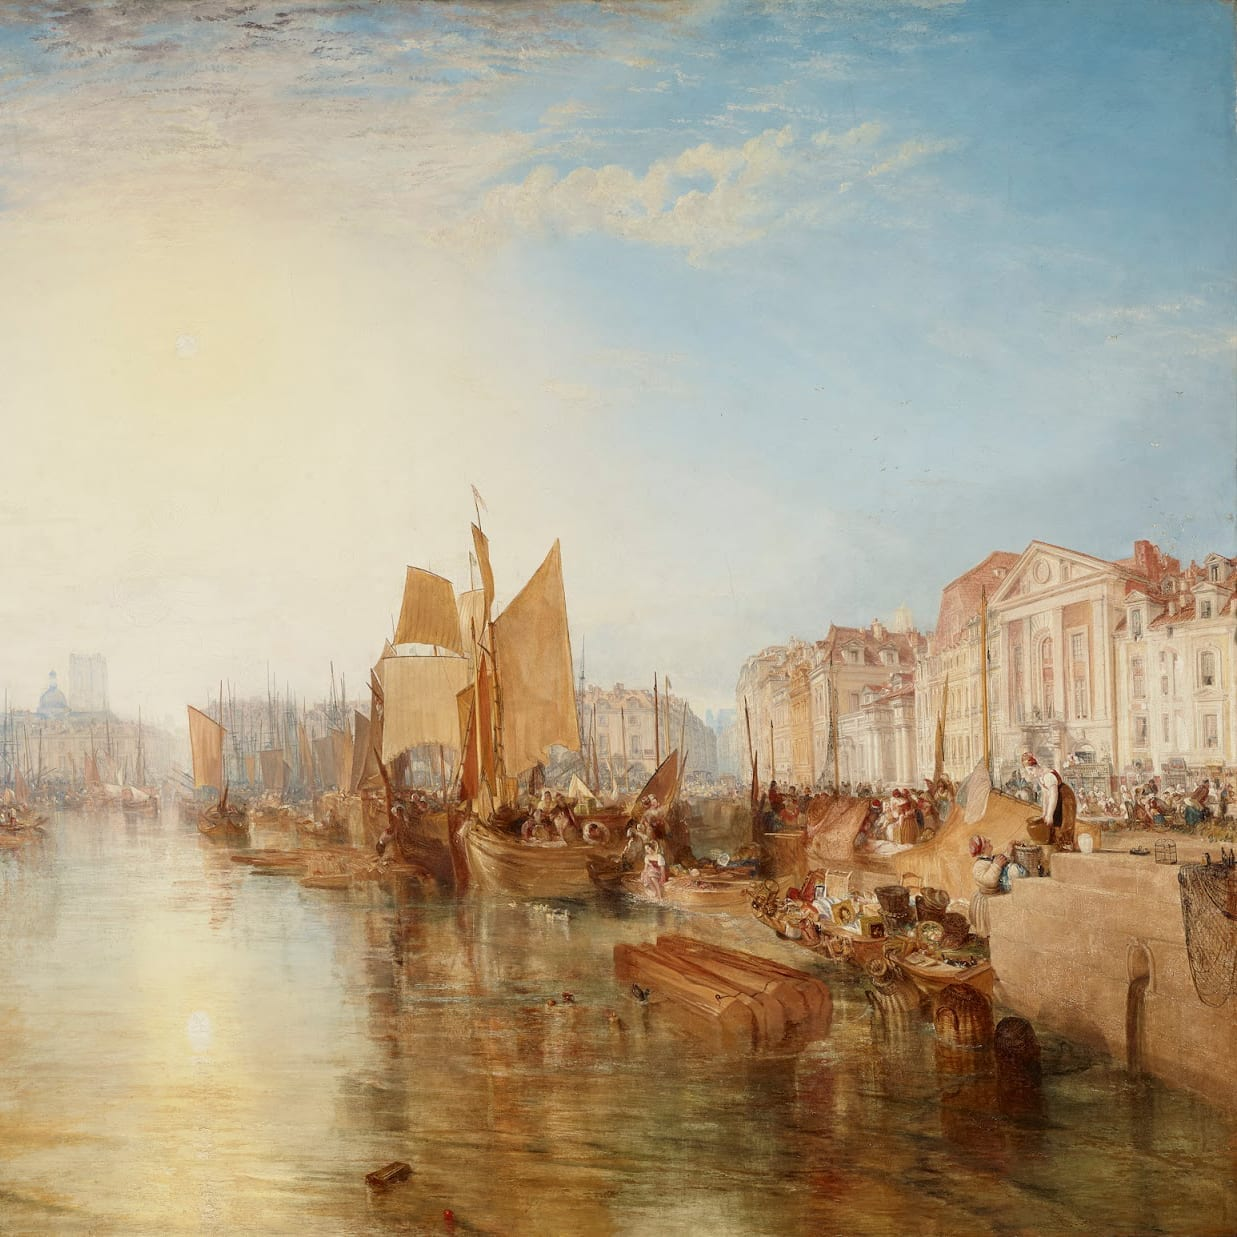 «Современный мир Тернера» (Turner's Modern World)